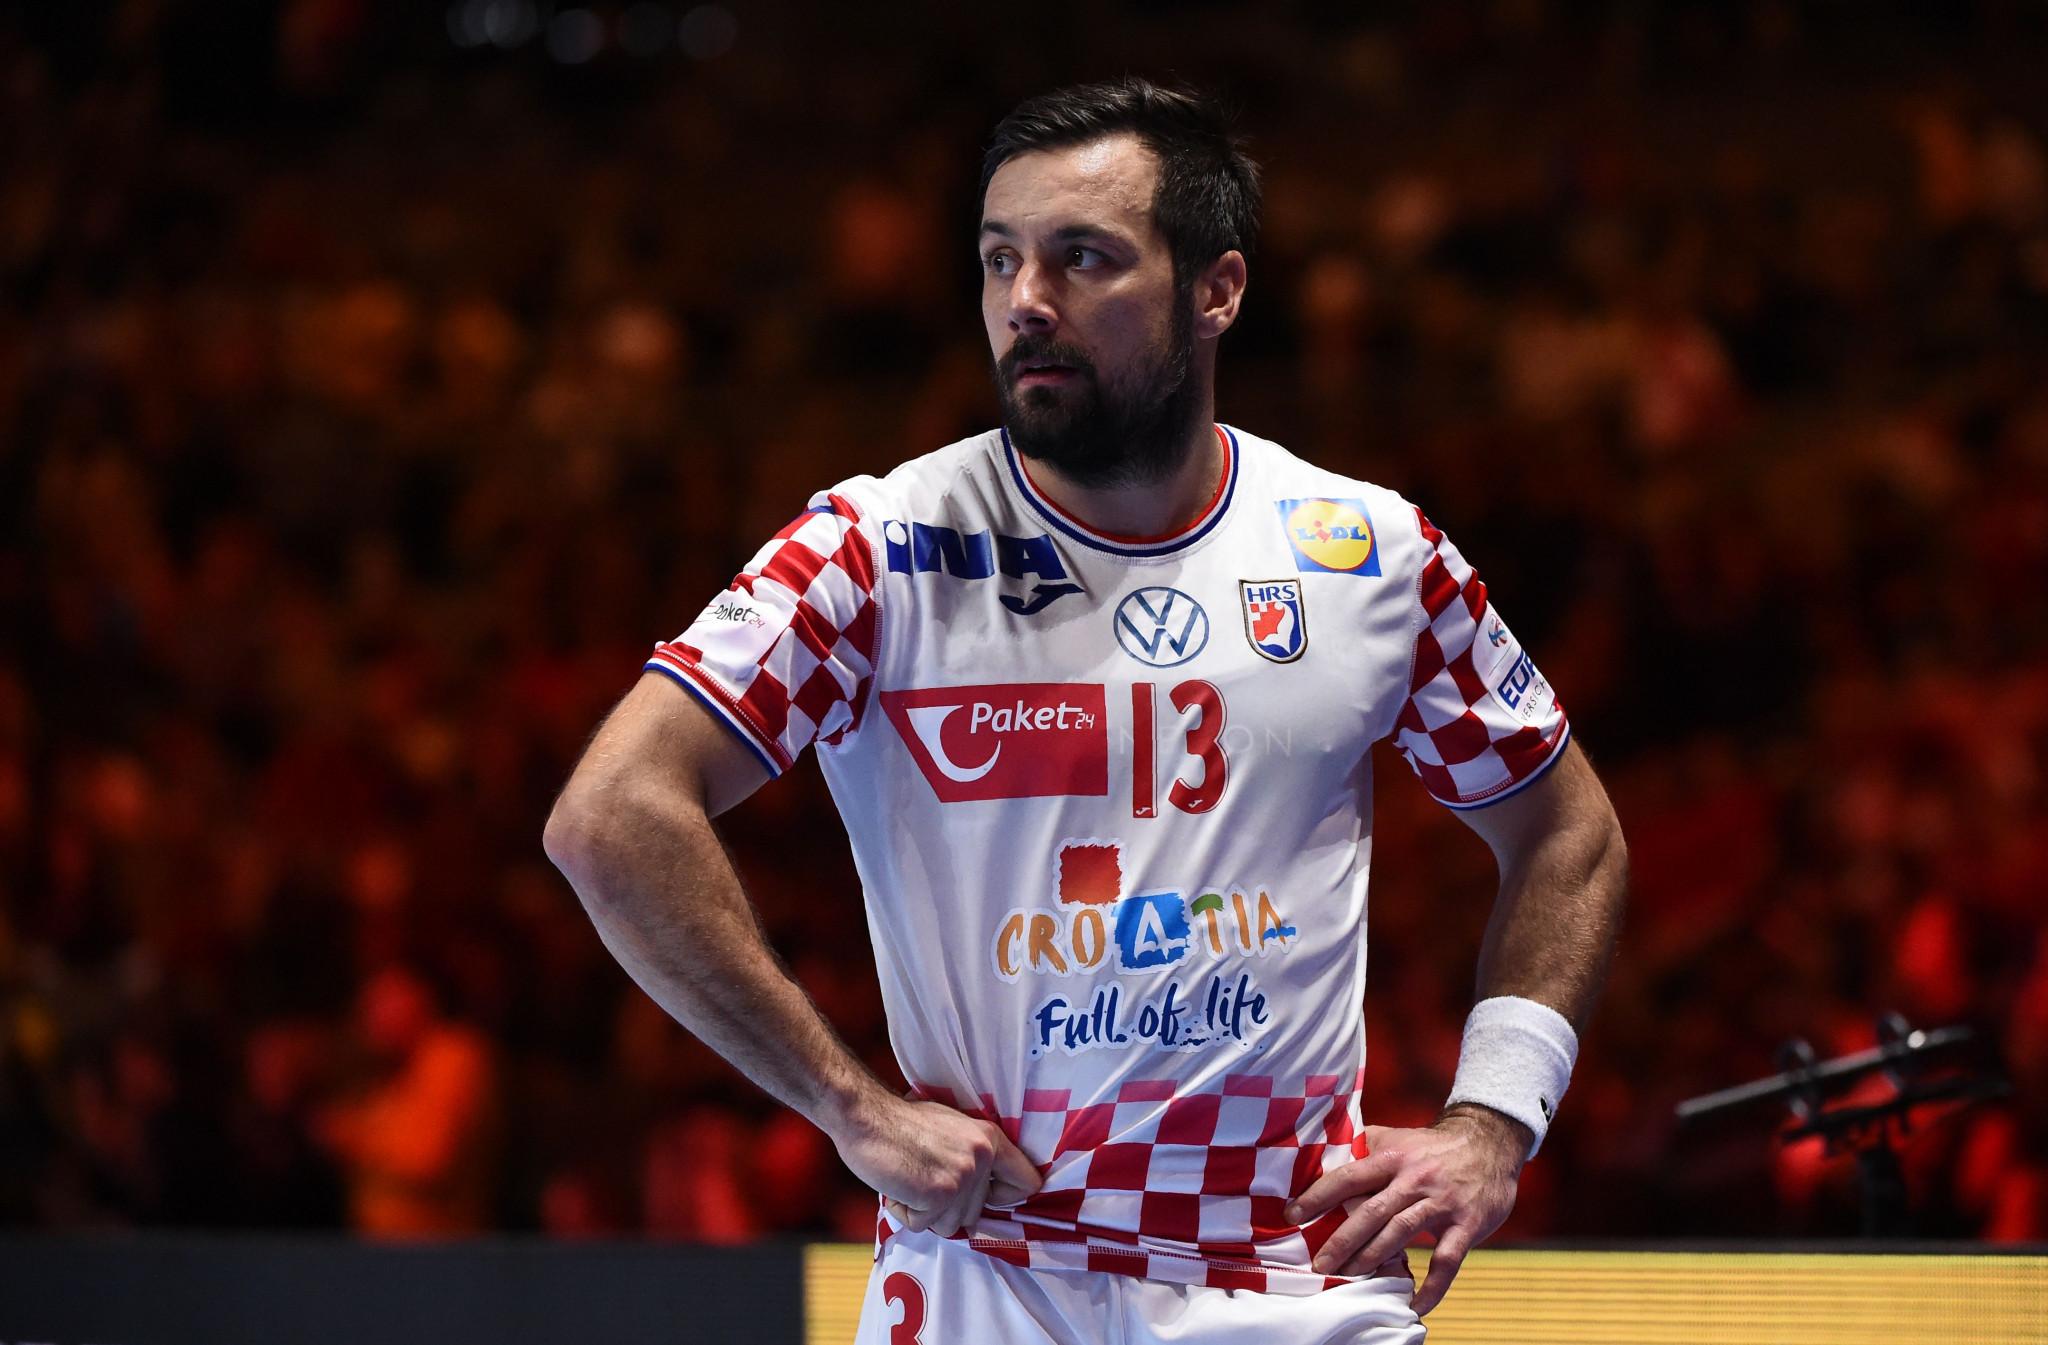 Croatia's looks on Zlatko Horvat after the European Men's Handball Championship final ©Getty Images